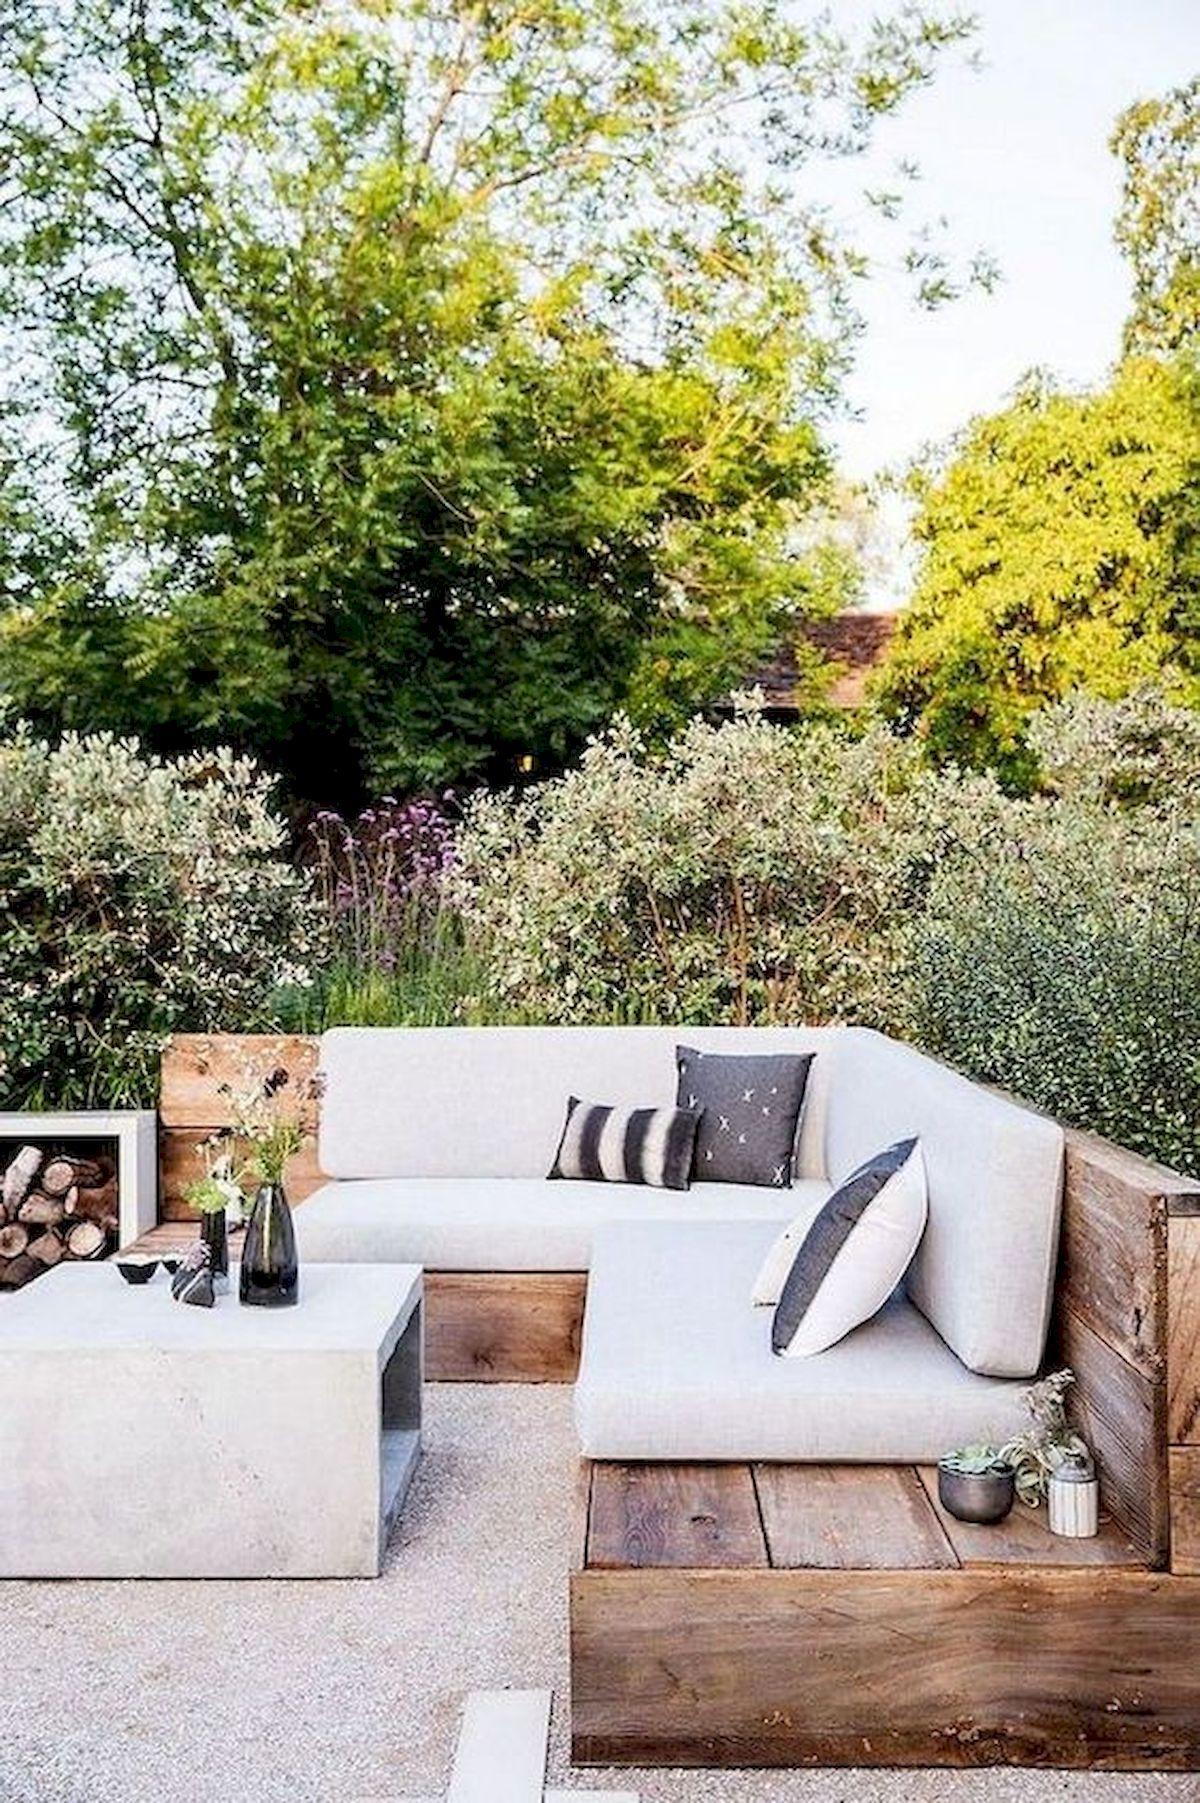 50 Fantastic Backyard Patio and Decking Design Ideas (41)